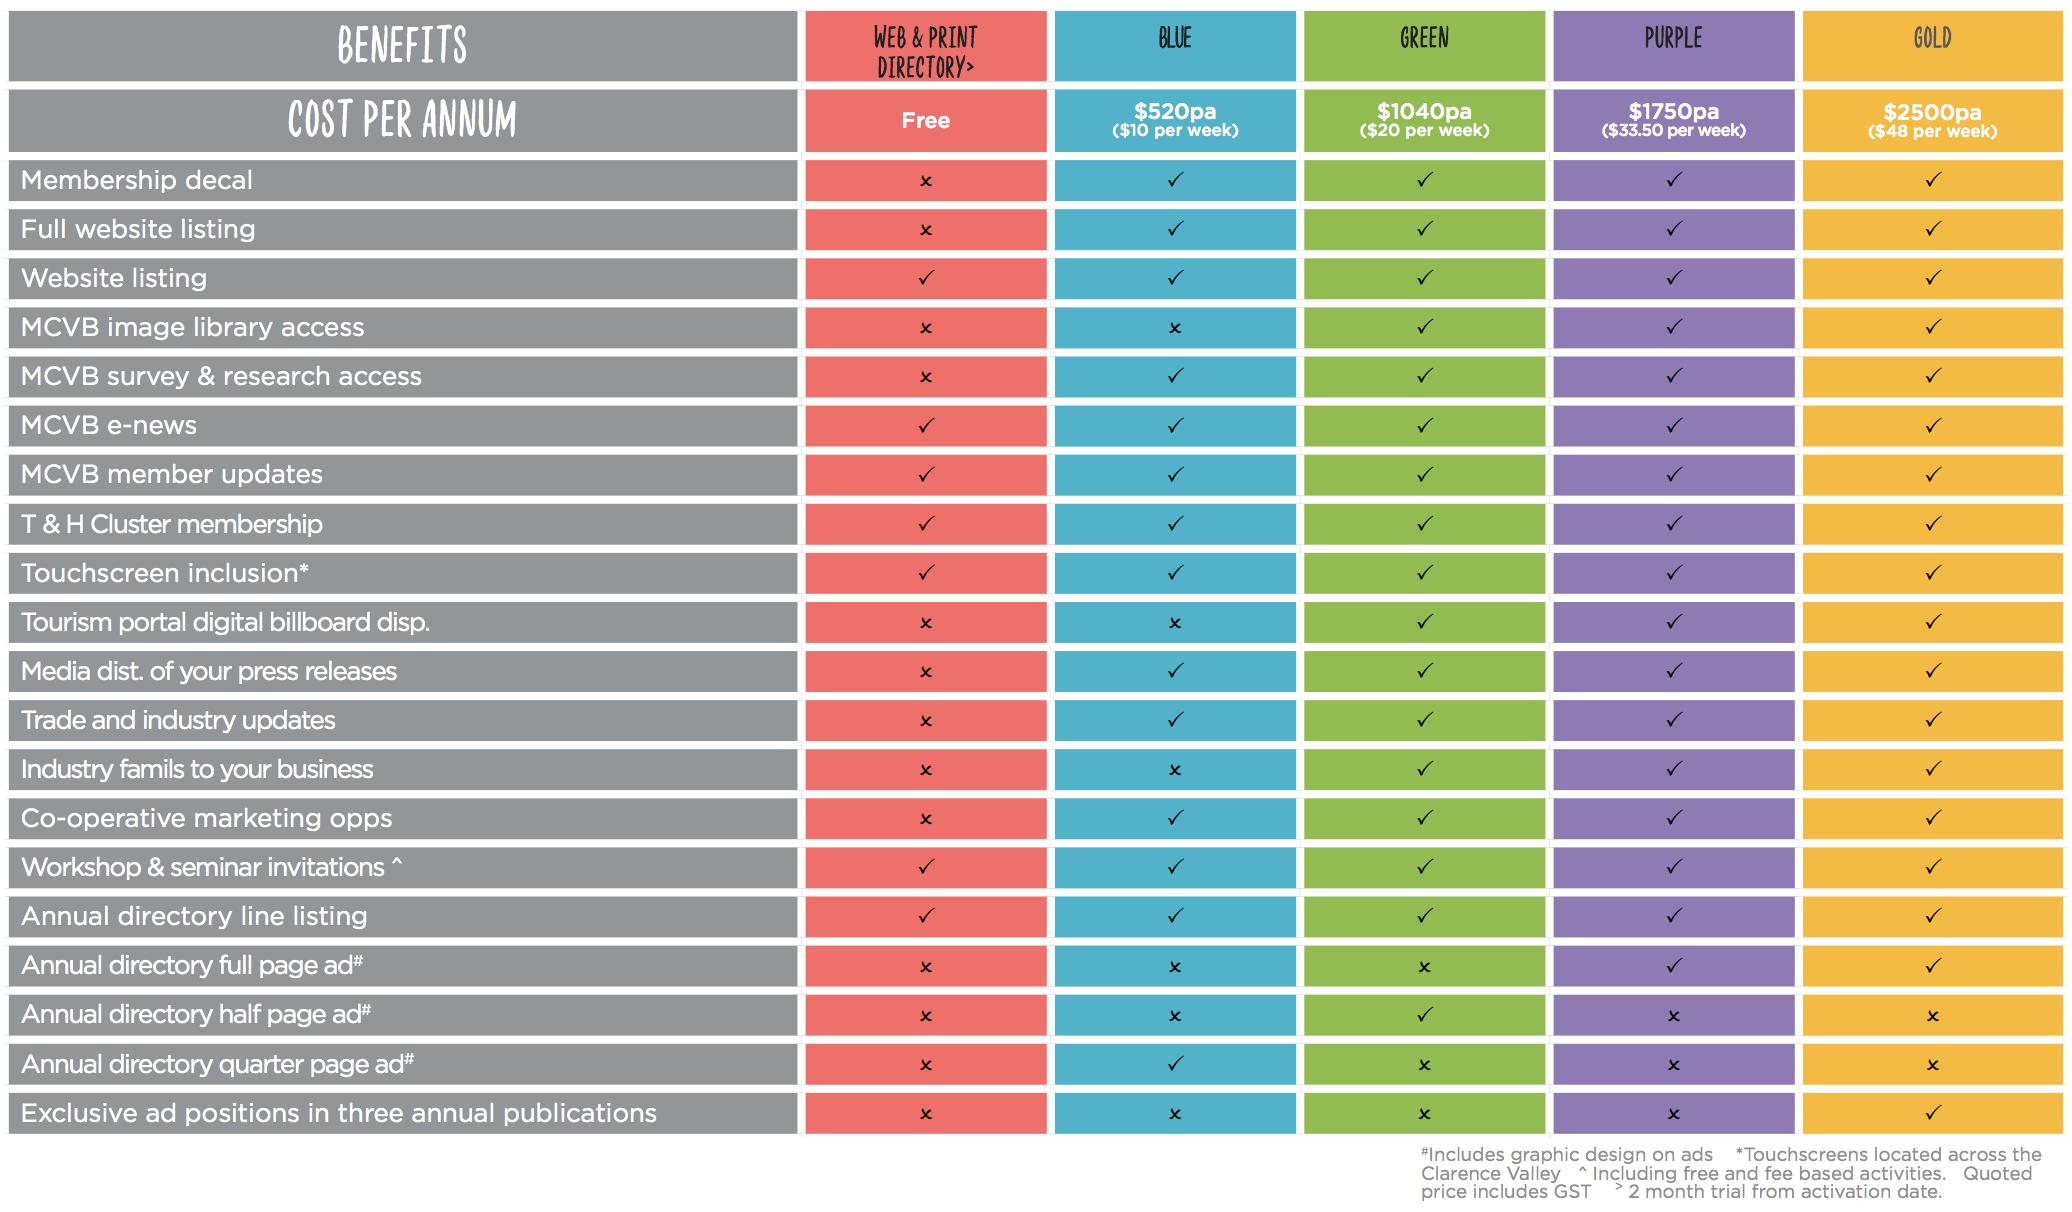 Cost/Benefit Comparison Table